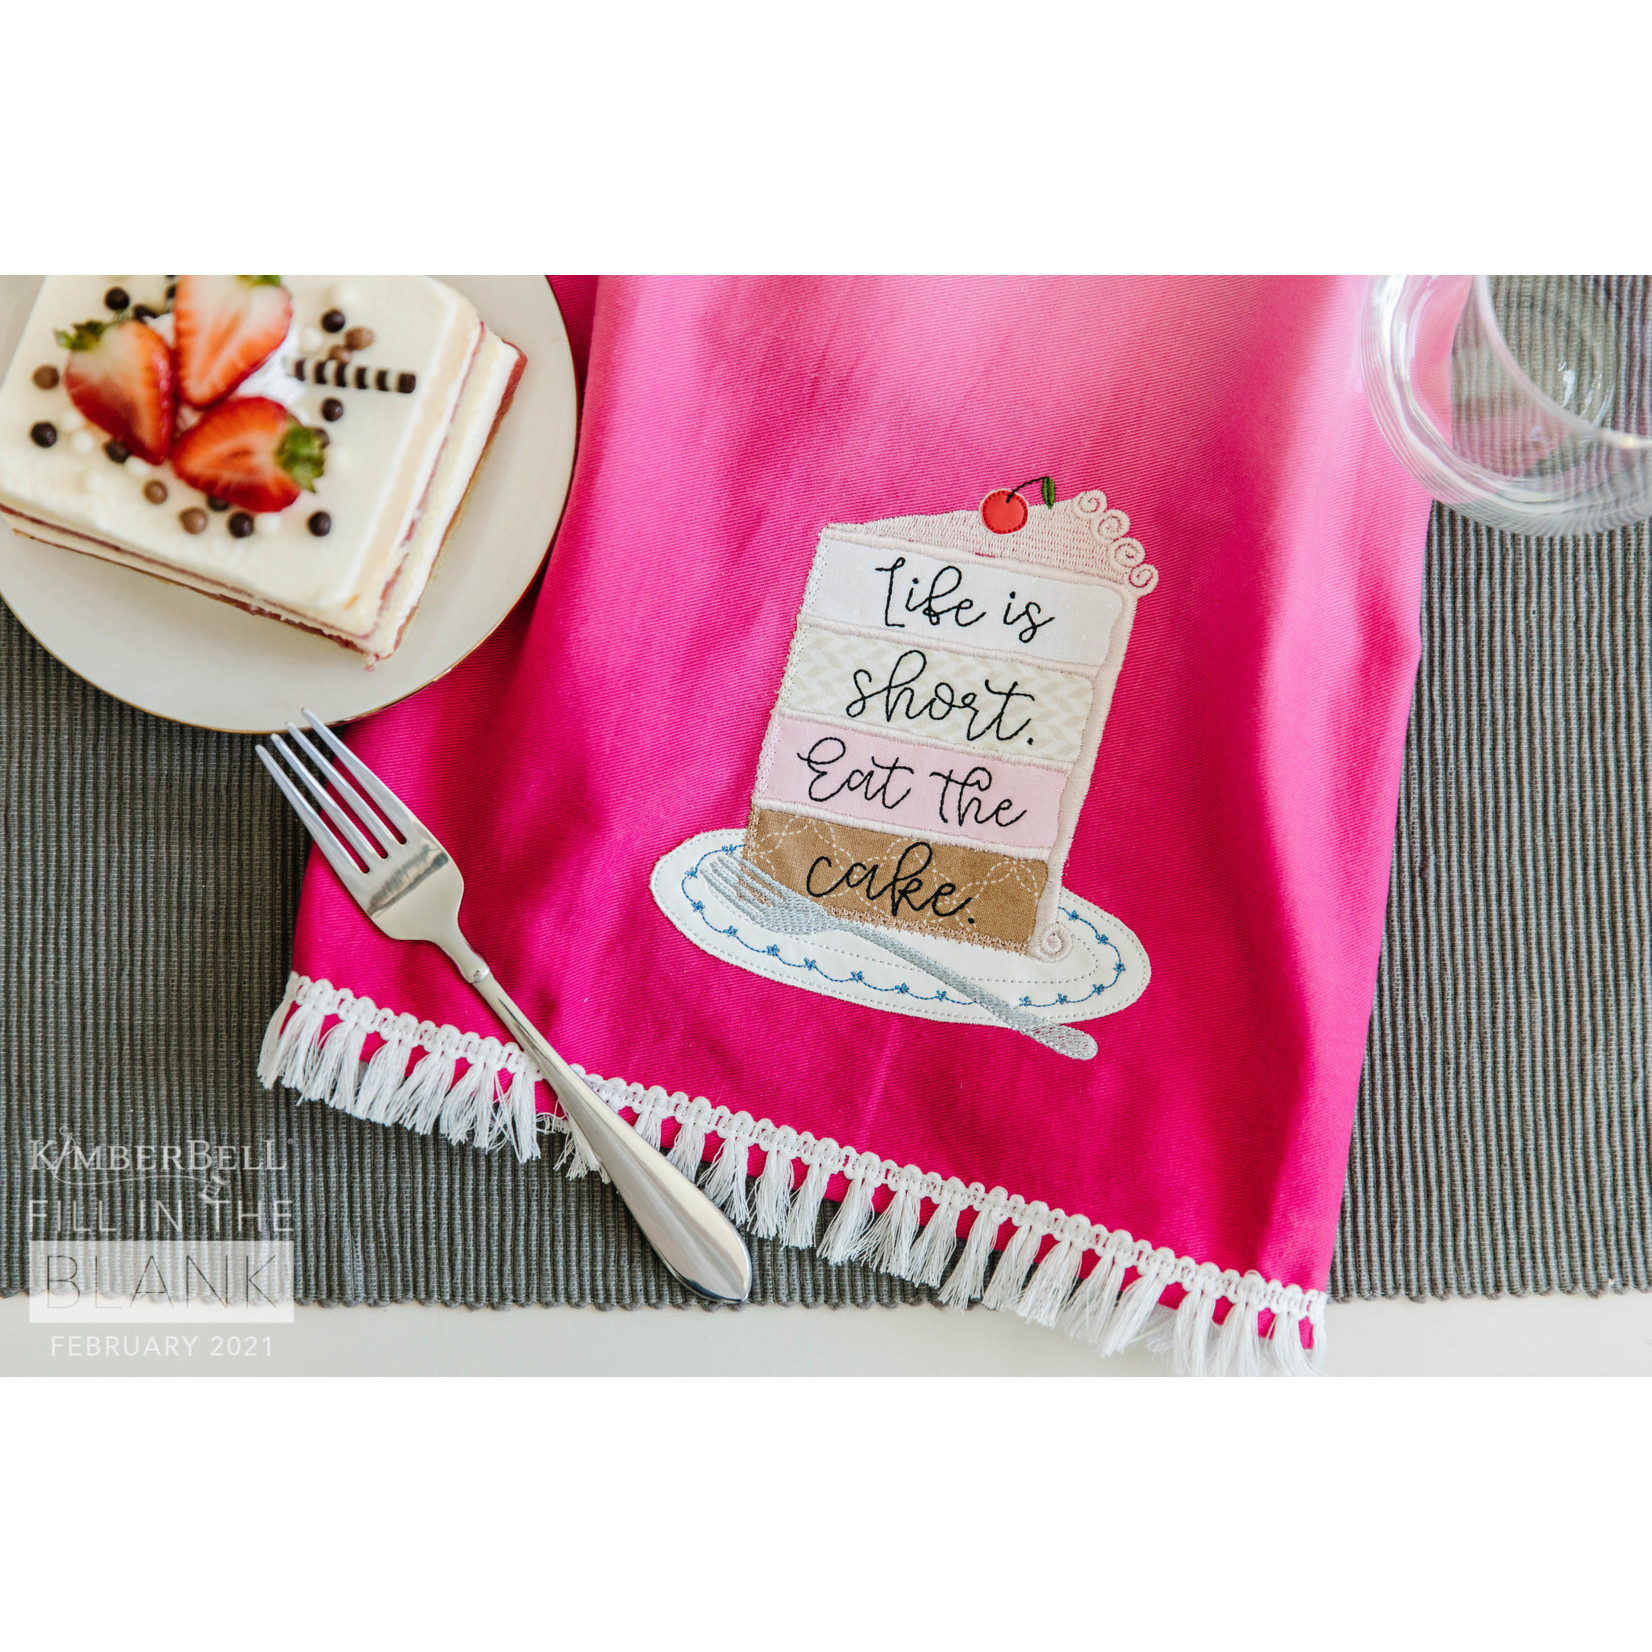 KIMBERBELL DESIGNS Fill in the Blank - Life Is Short Tea Towel Kit